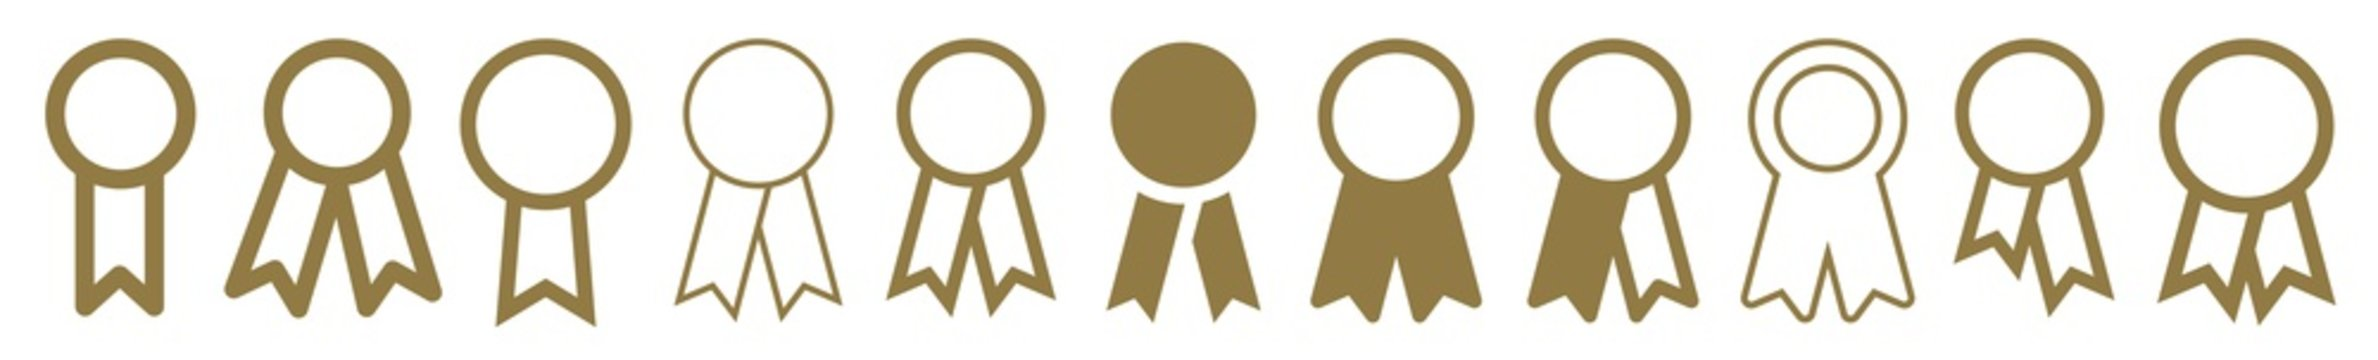 Medal Ribbon Icon Gold | Award Illustration | Badge Symbol | Prize Logo | Honor Sign | Isolated | Variations